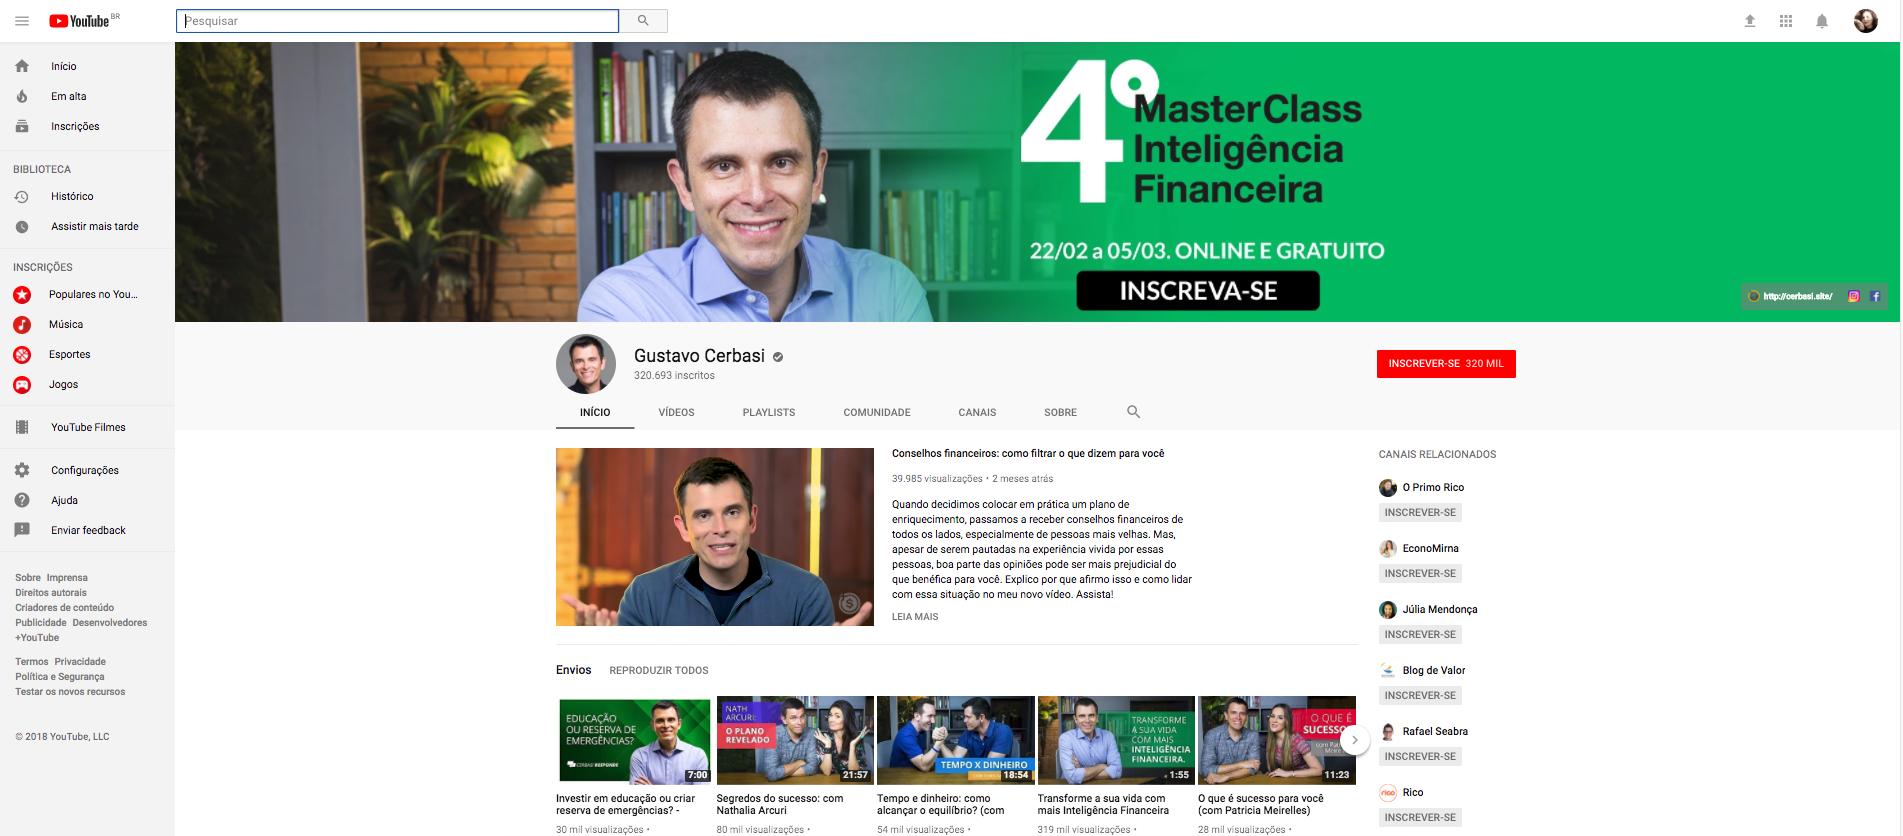 canal-youtube-gustavo-cerbasi-digital-influencer-postgrain